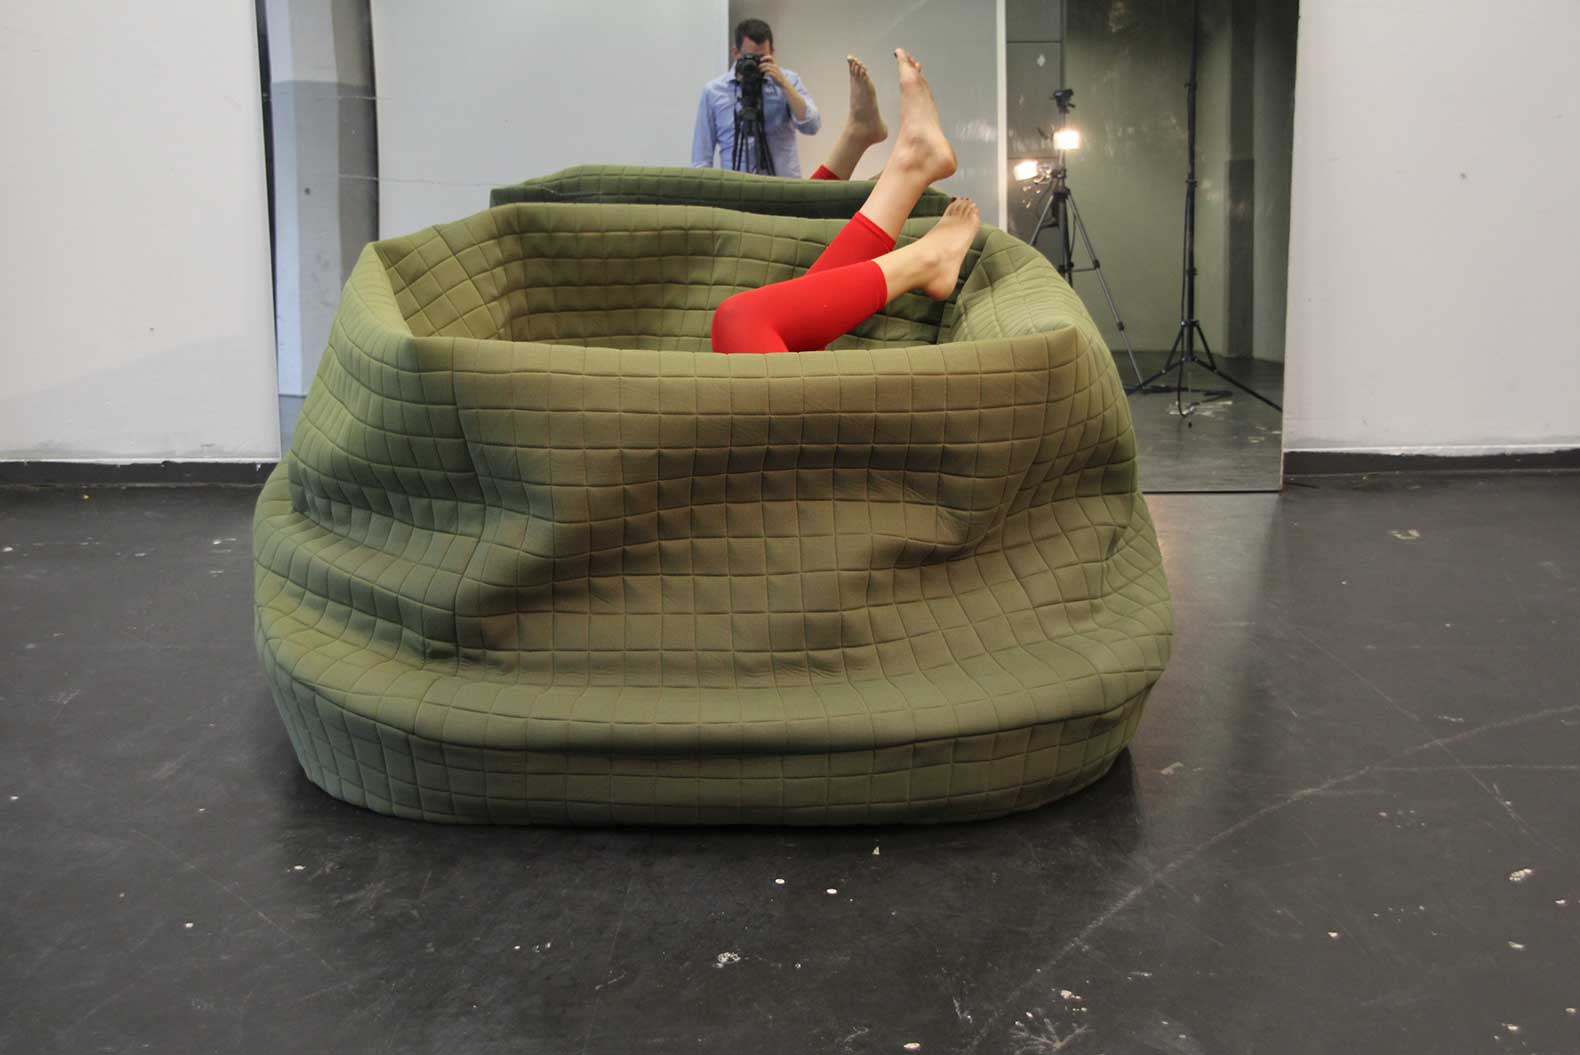 Sofas Frankfurt moody nest is a cuddly wrap up sofa for hibernation 6sqft